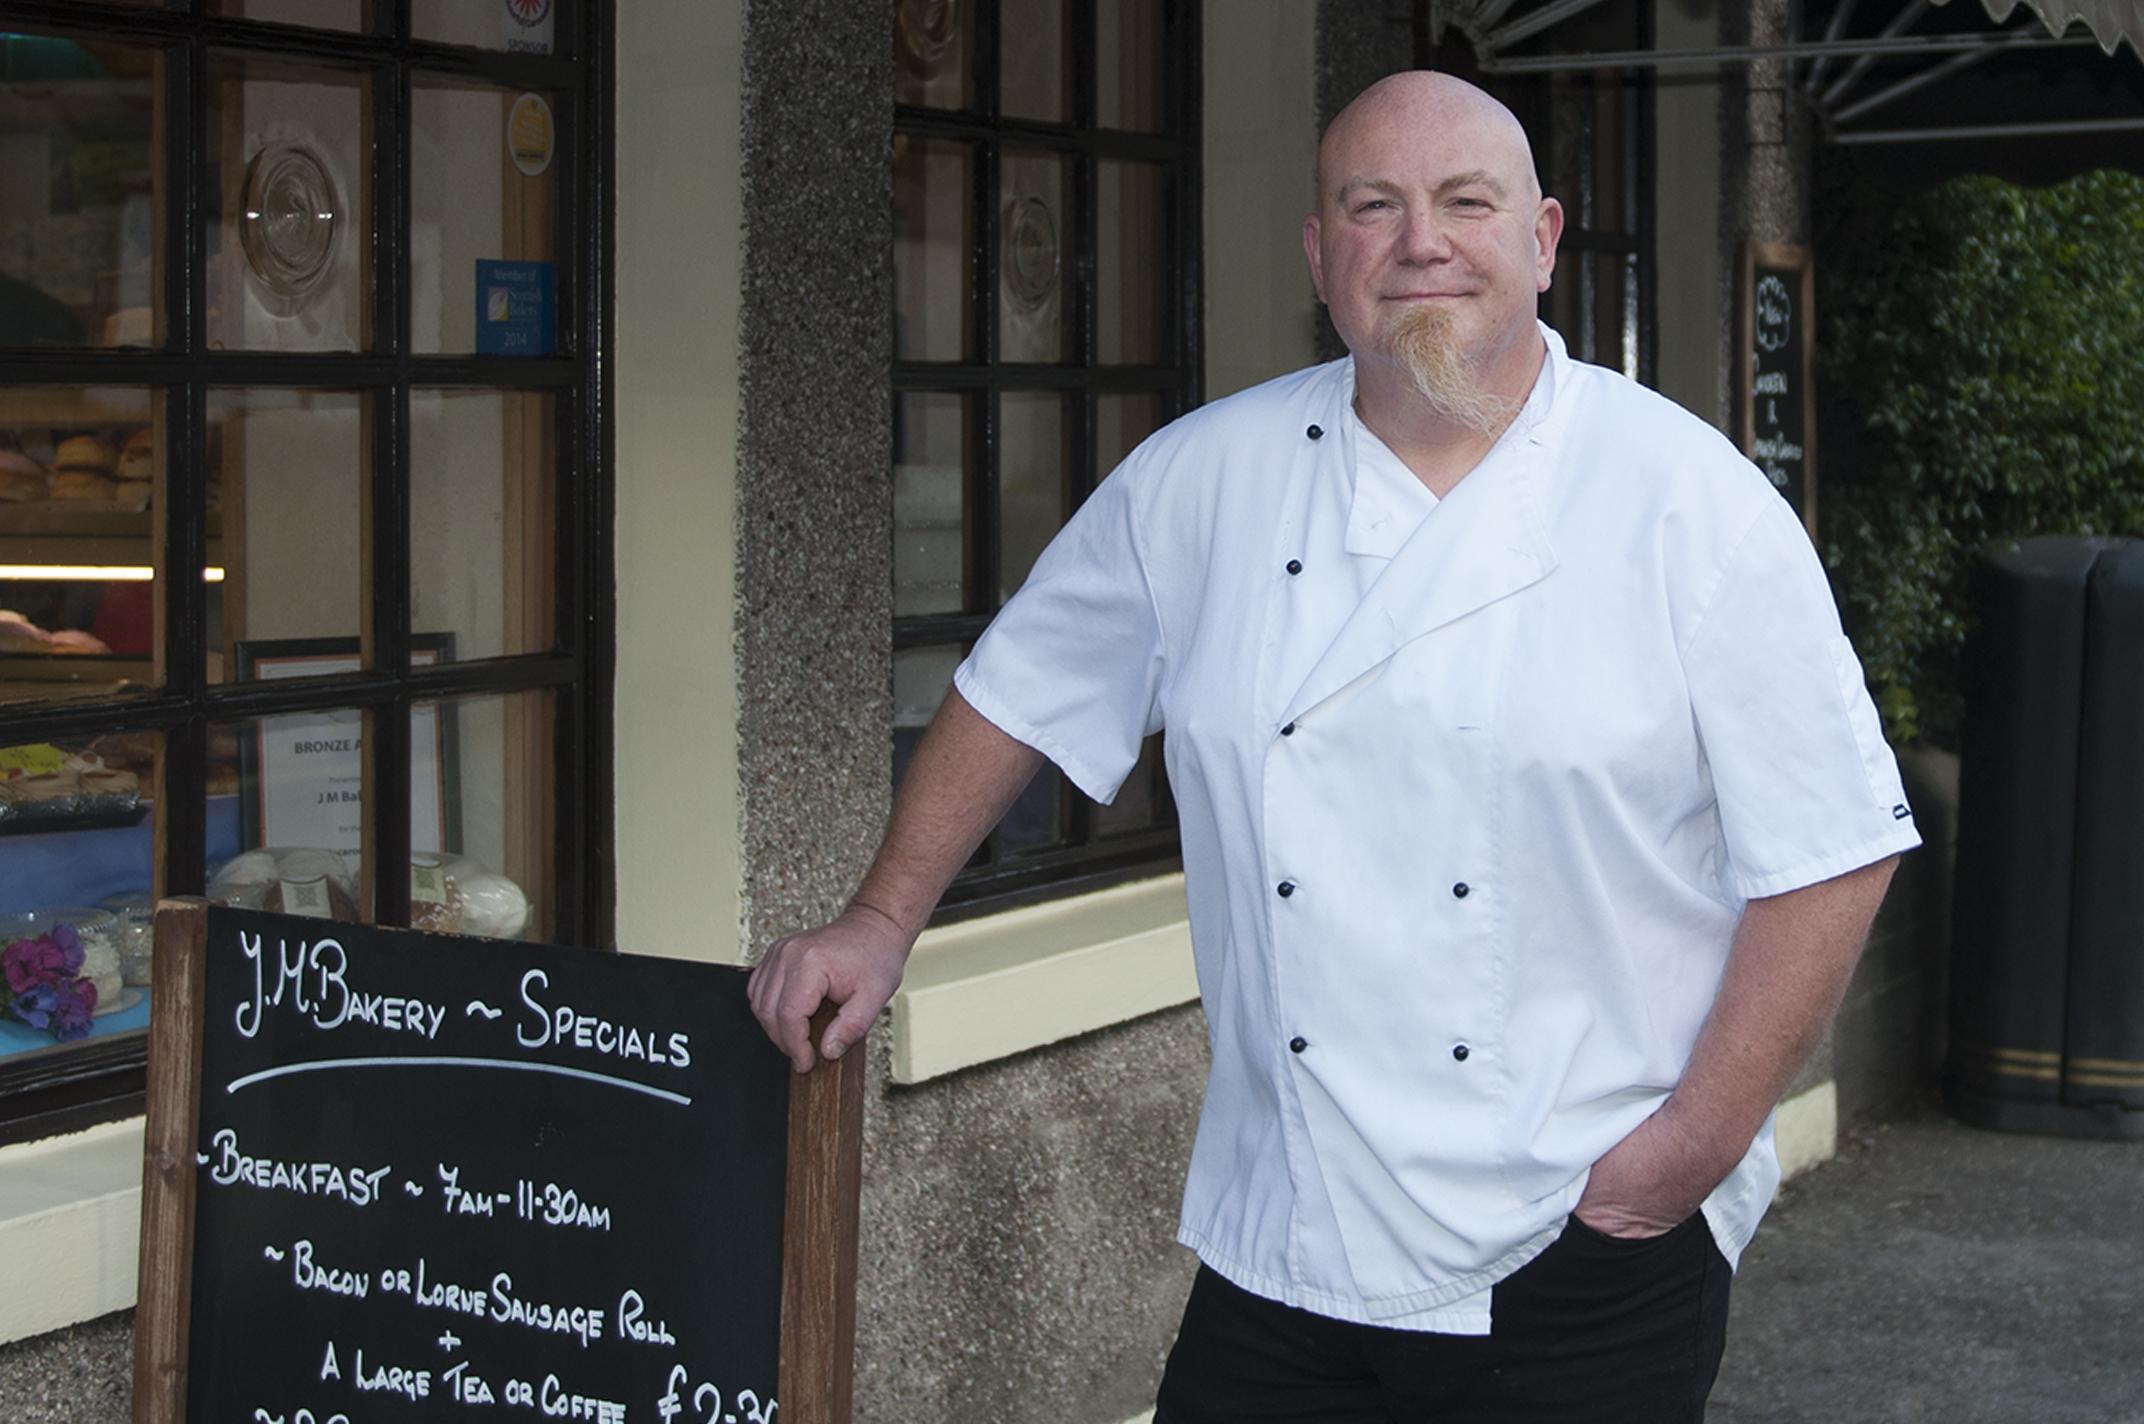 Mark Robb of J M Bakery in Carnoustie